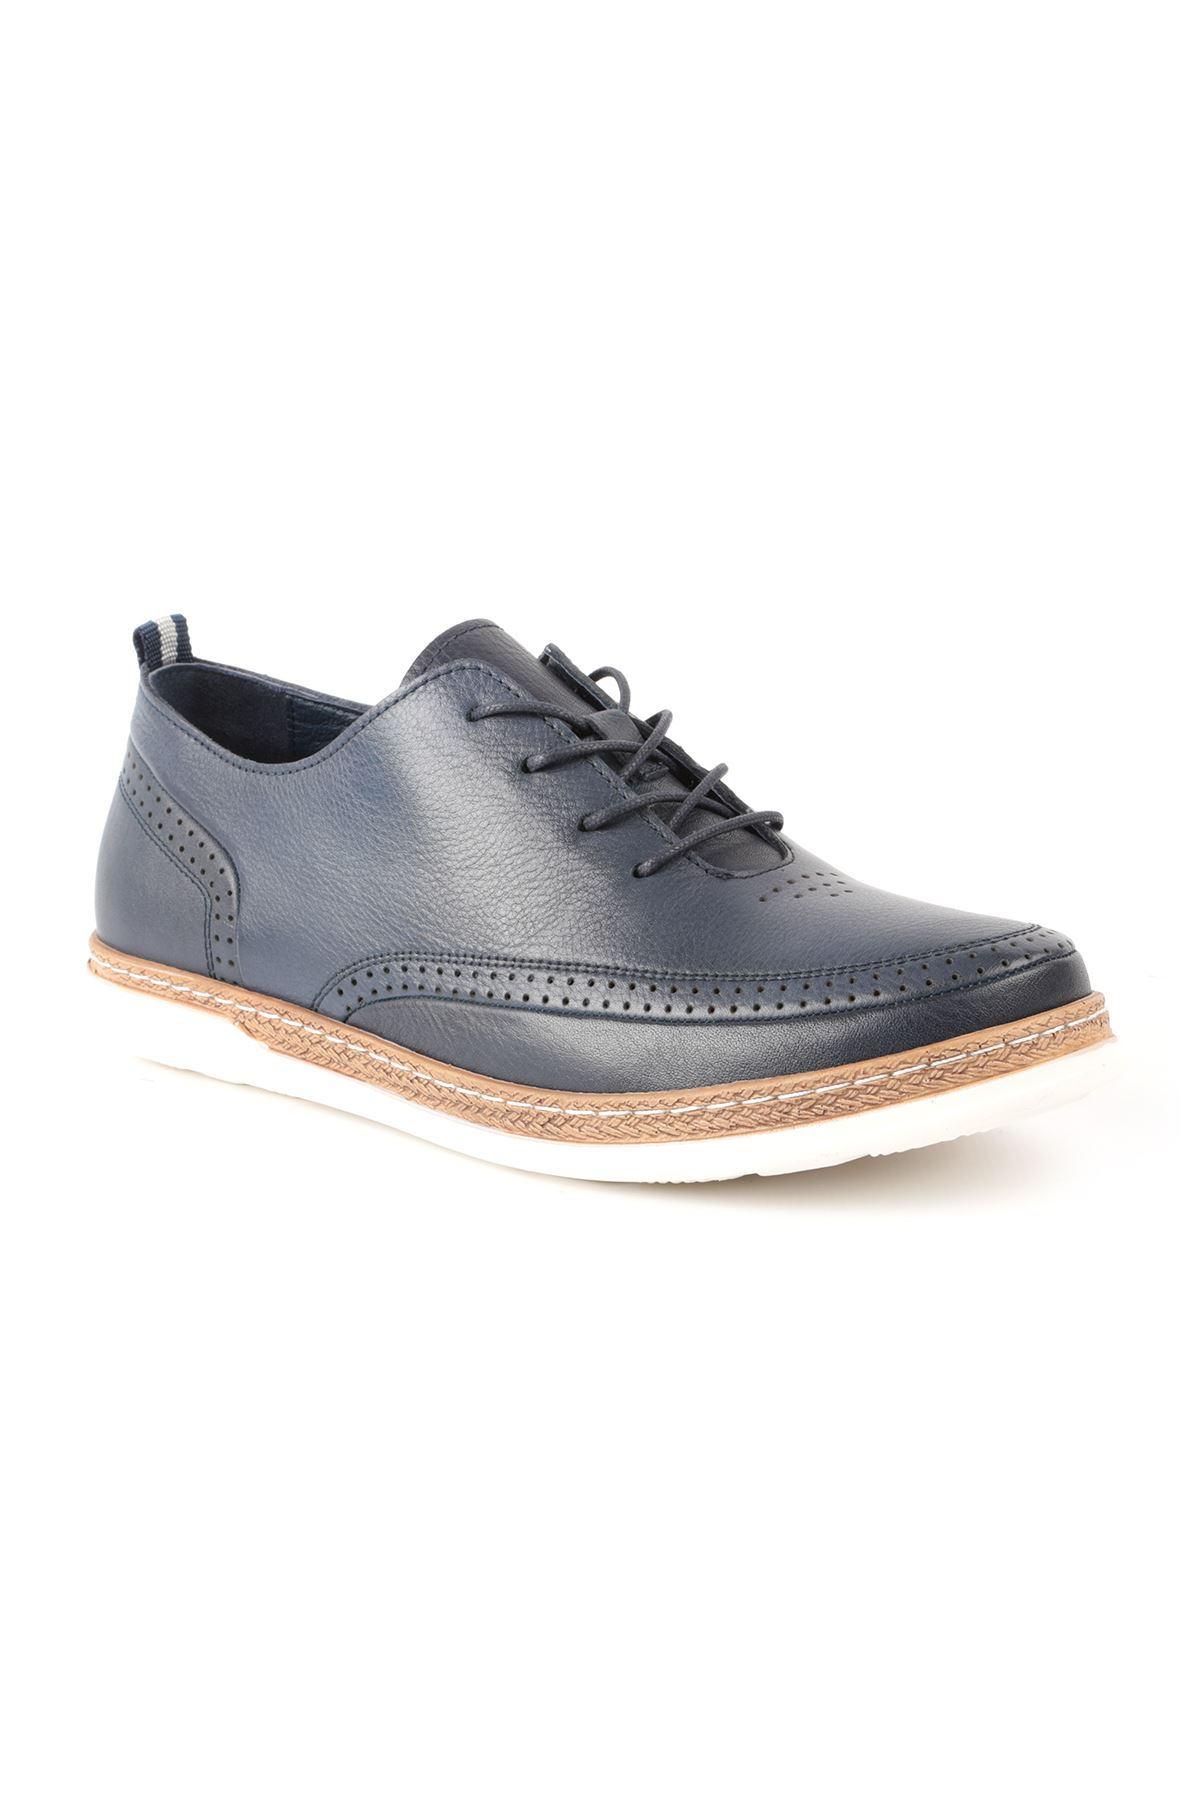 Libero L3633 Lacivert Erkek Casual Ayakkabı